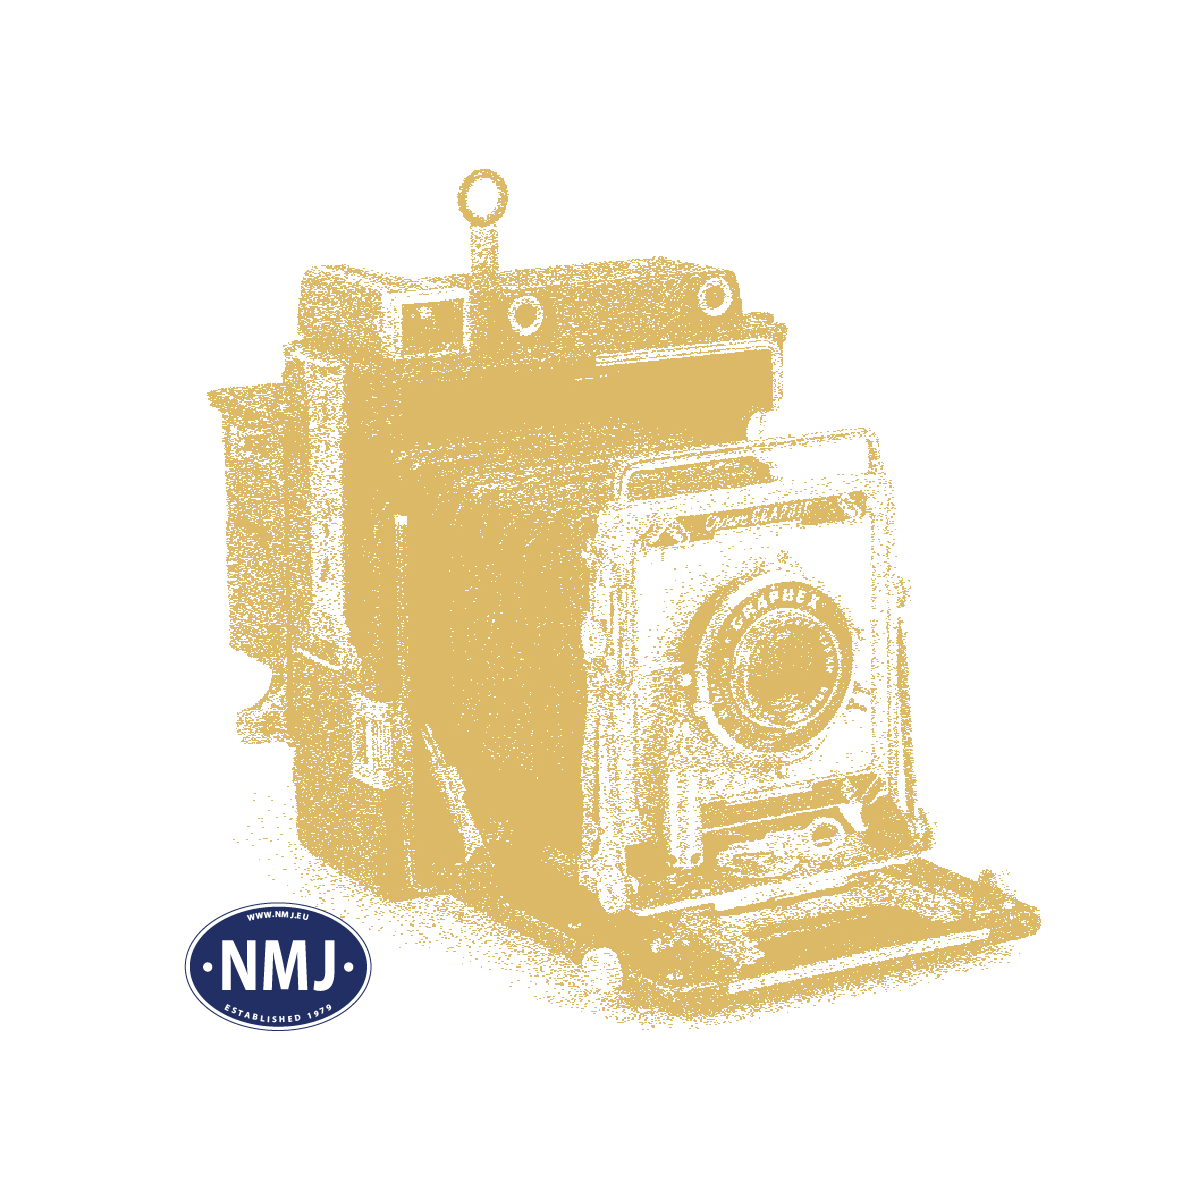 NMJT502.304 - NMJ Topline NSB Kbps 21 76 335 3 742-8 w/ Timber Load